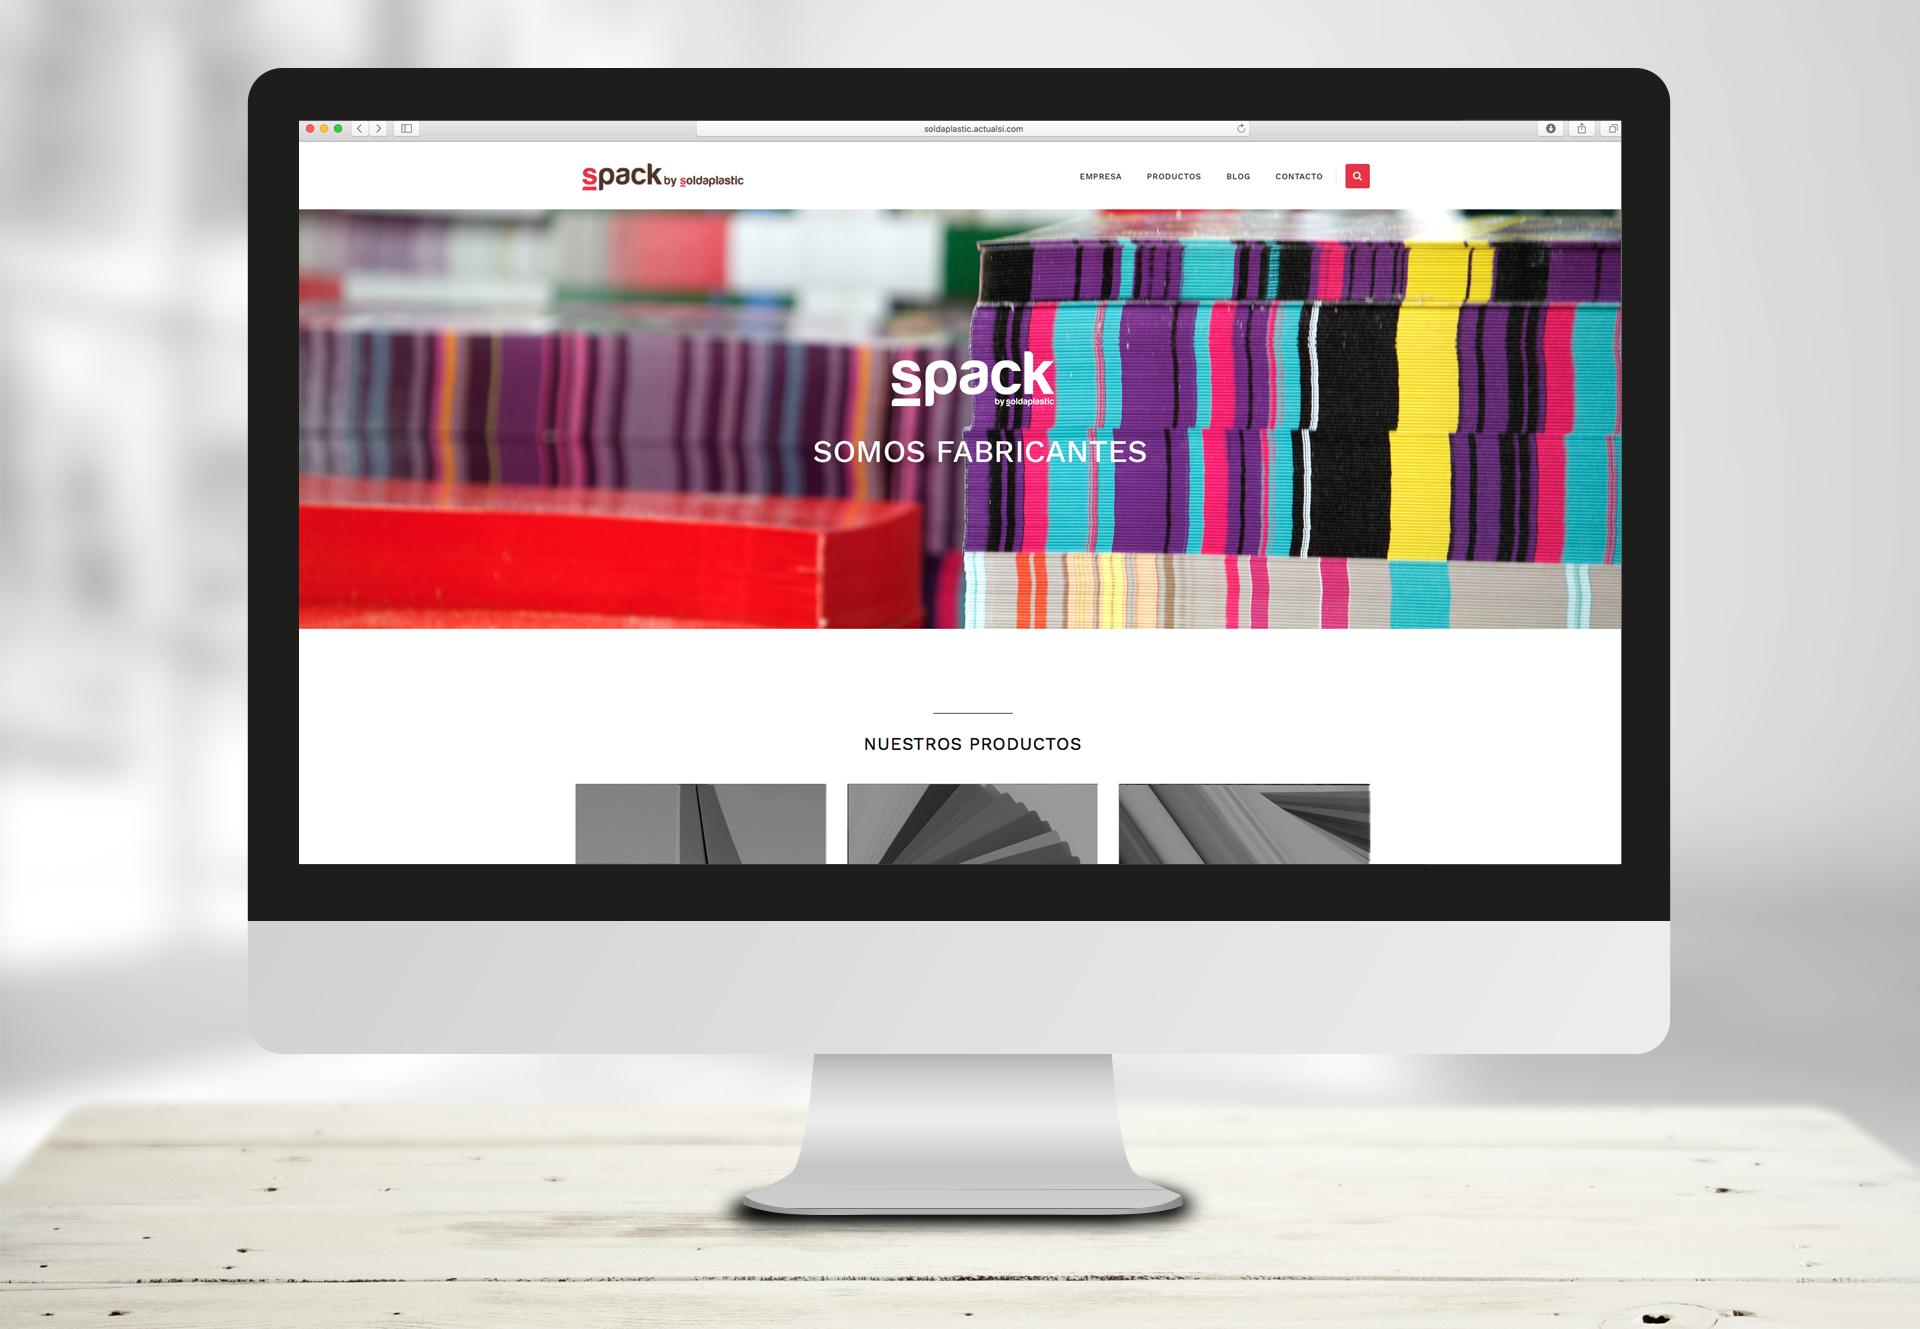 pagina web en pantalla ordenador